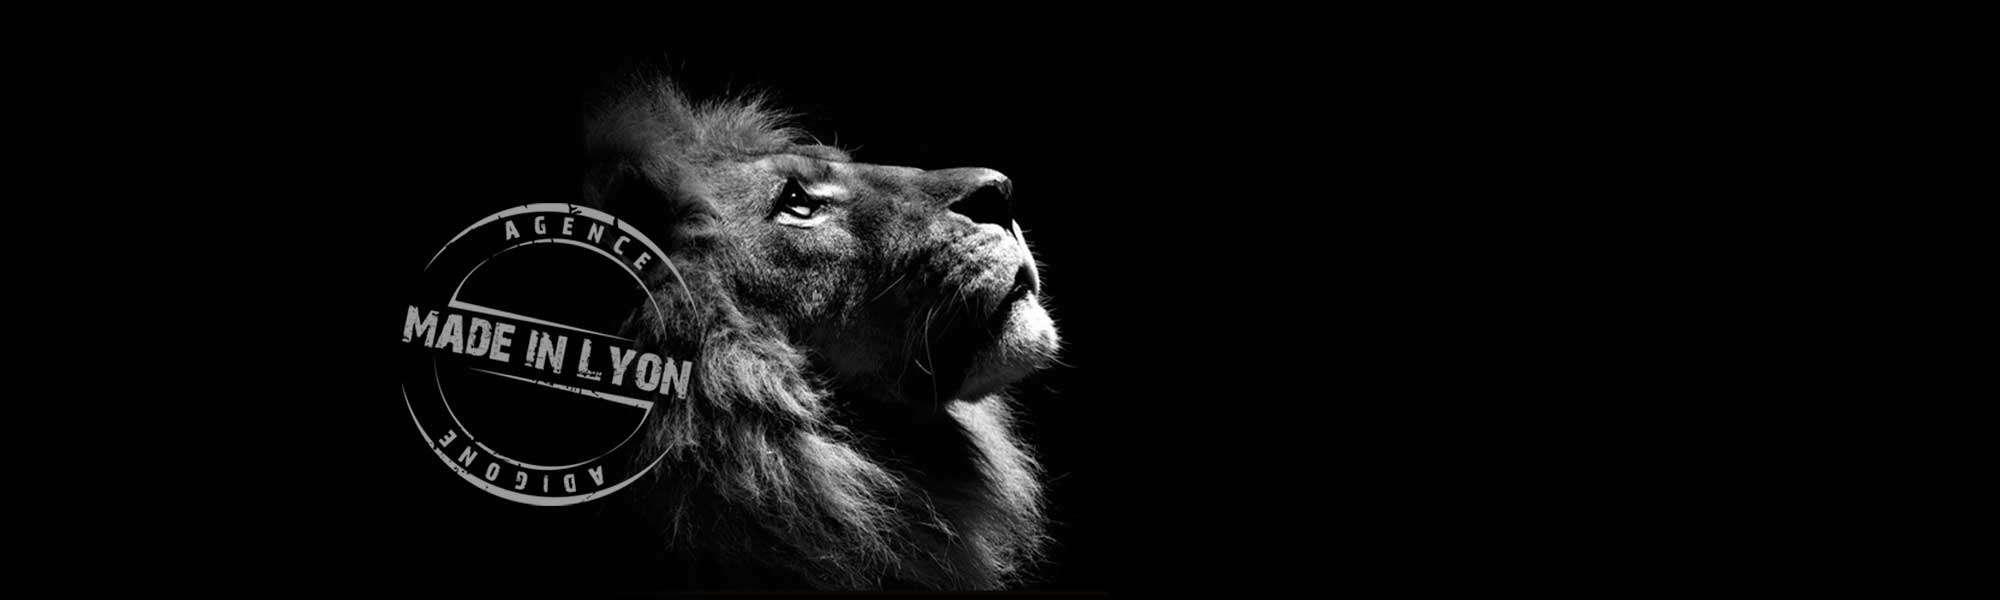 adigone-visuel-lion-made-in-lyon